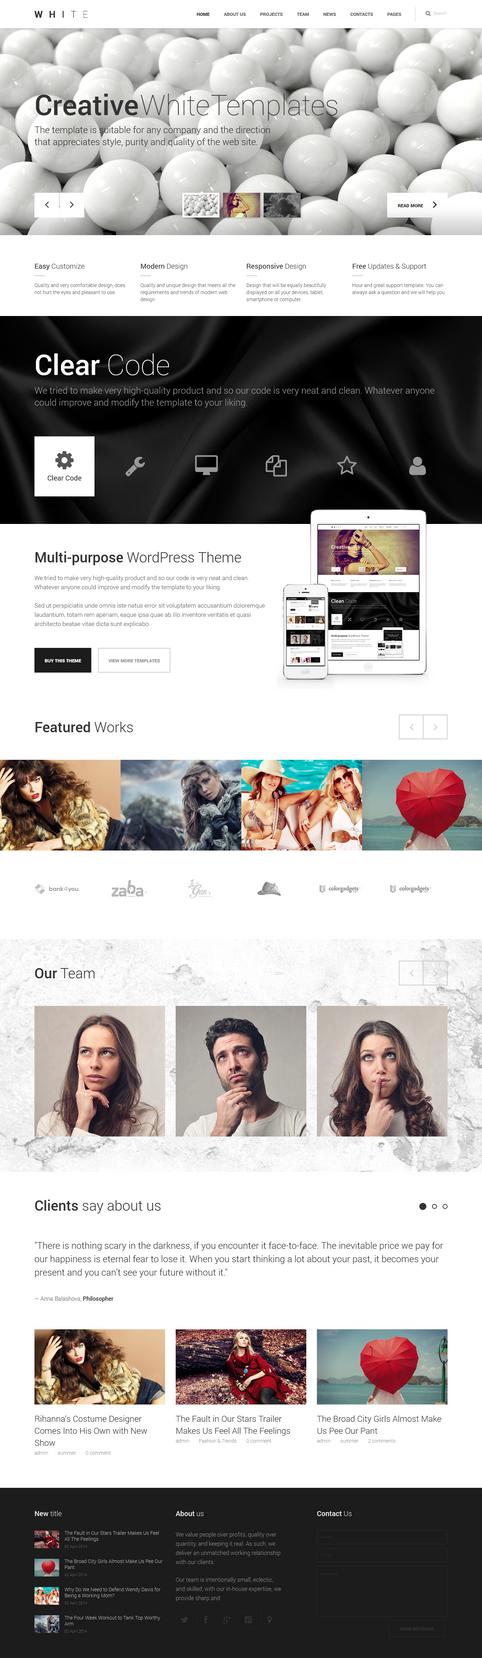 WHITE - Creative Theme by webdesigngeek